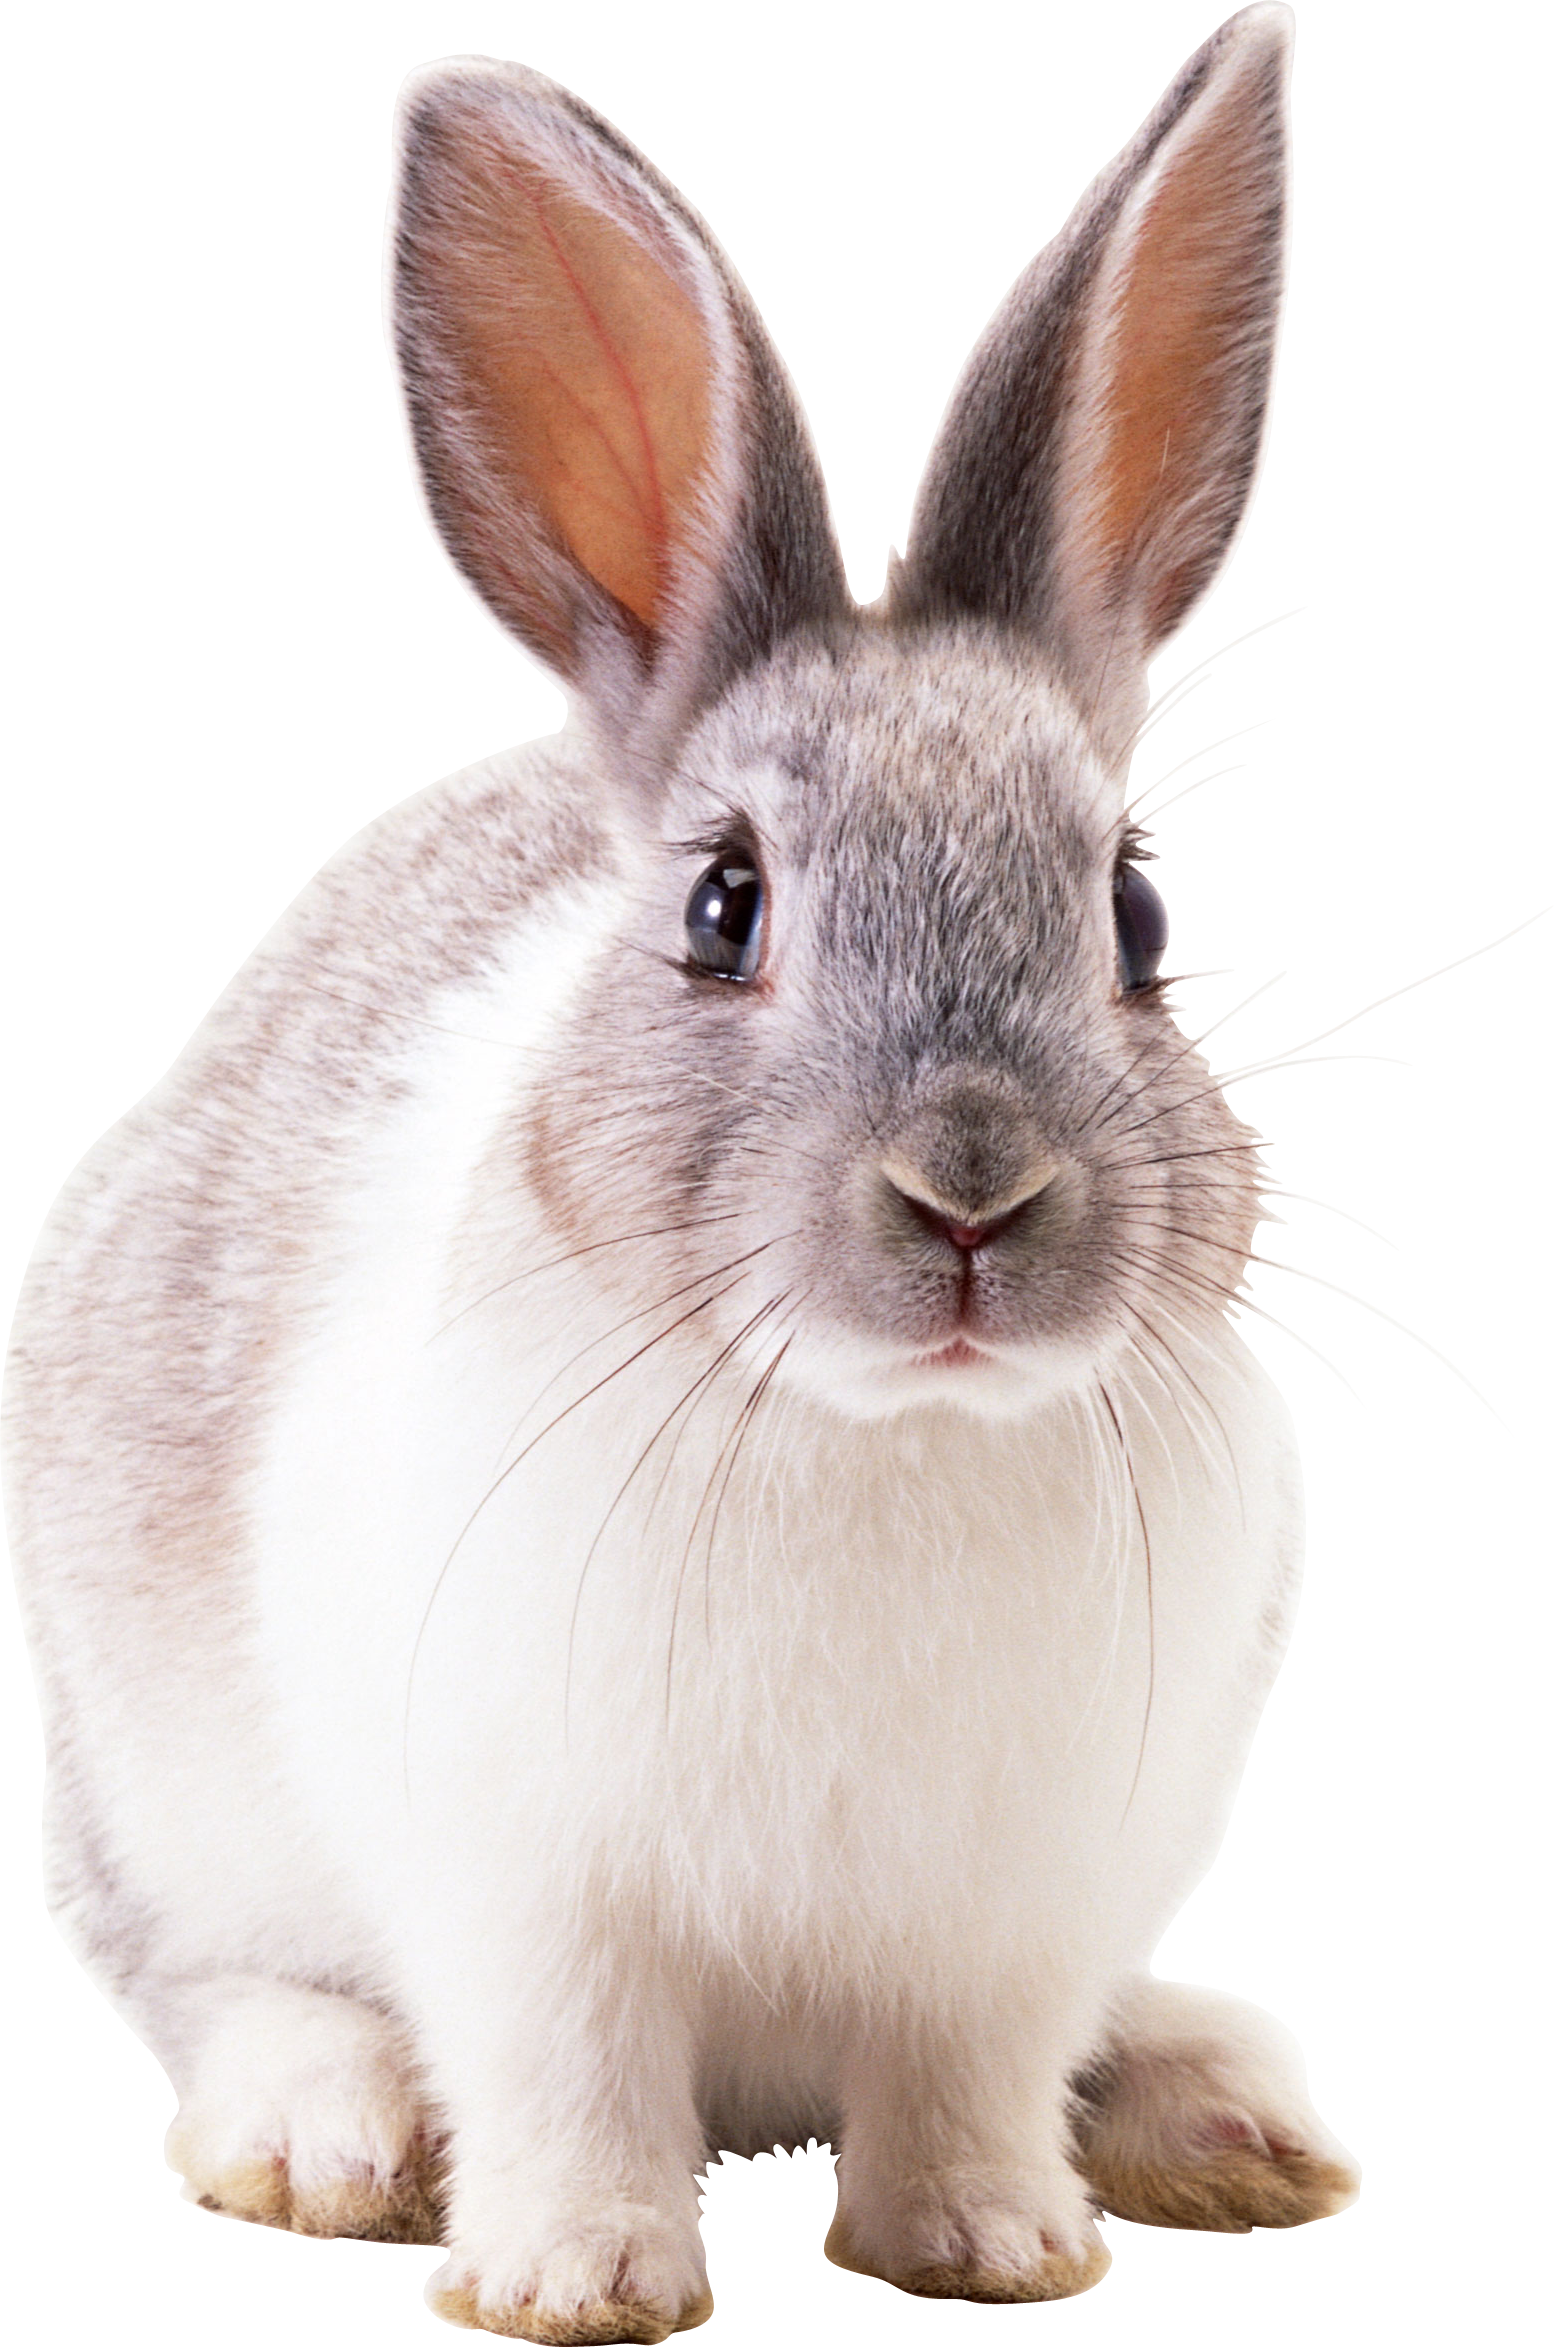 Rabbit PNG - 2857